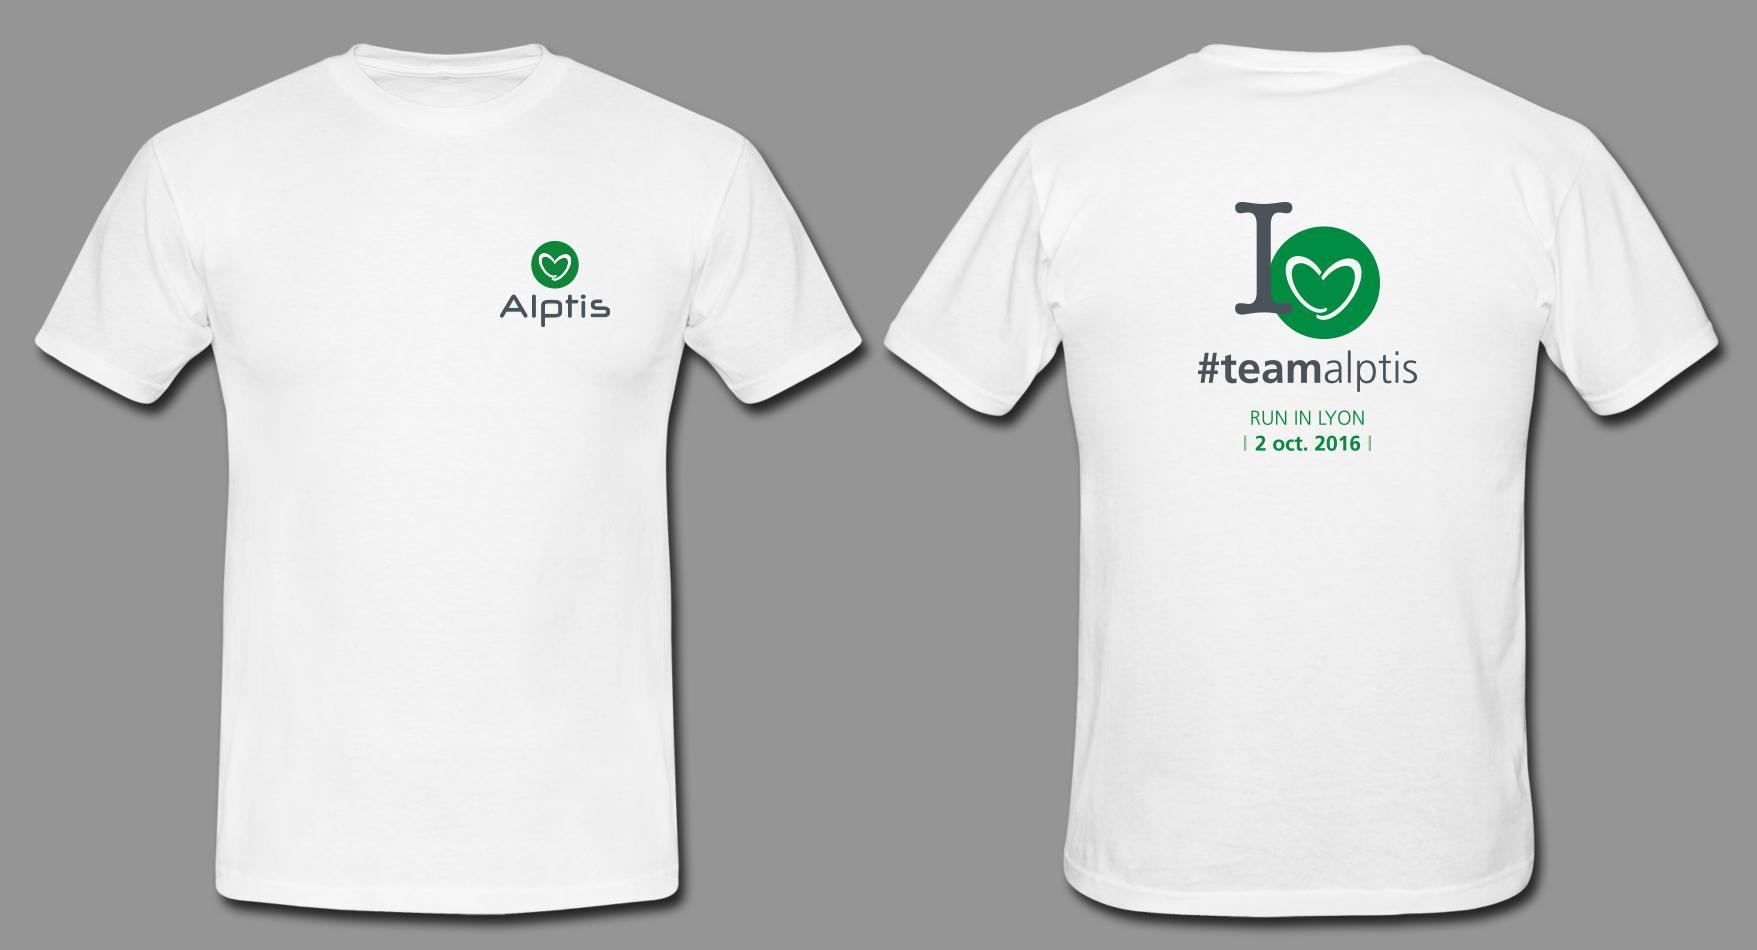 Run In Lyon 2016 T-Shirt Alptis